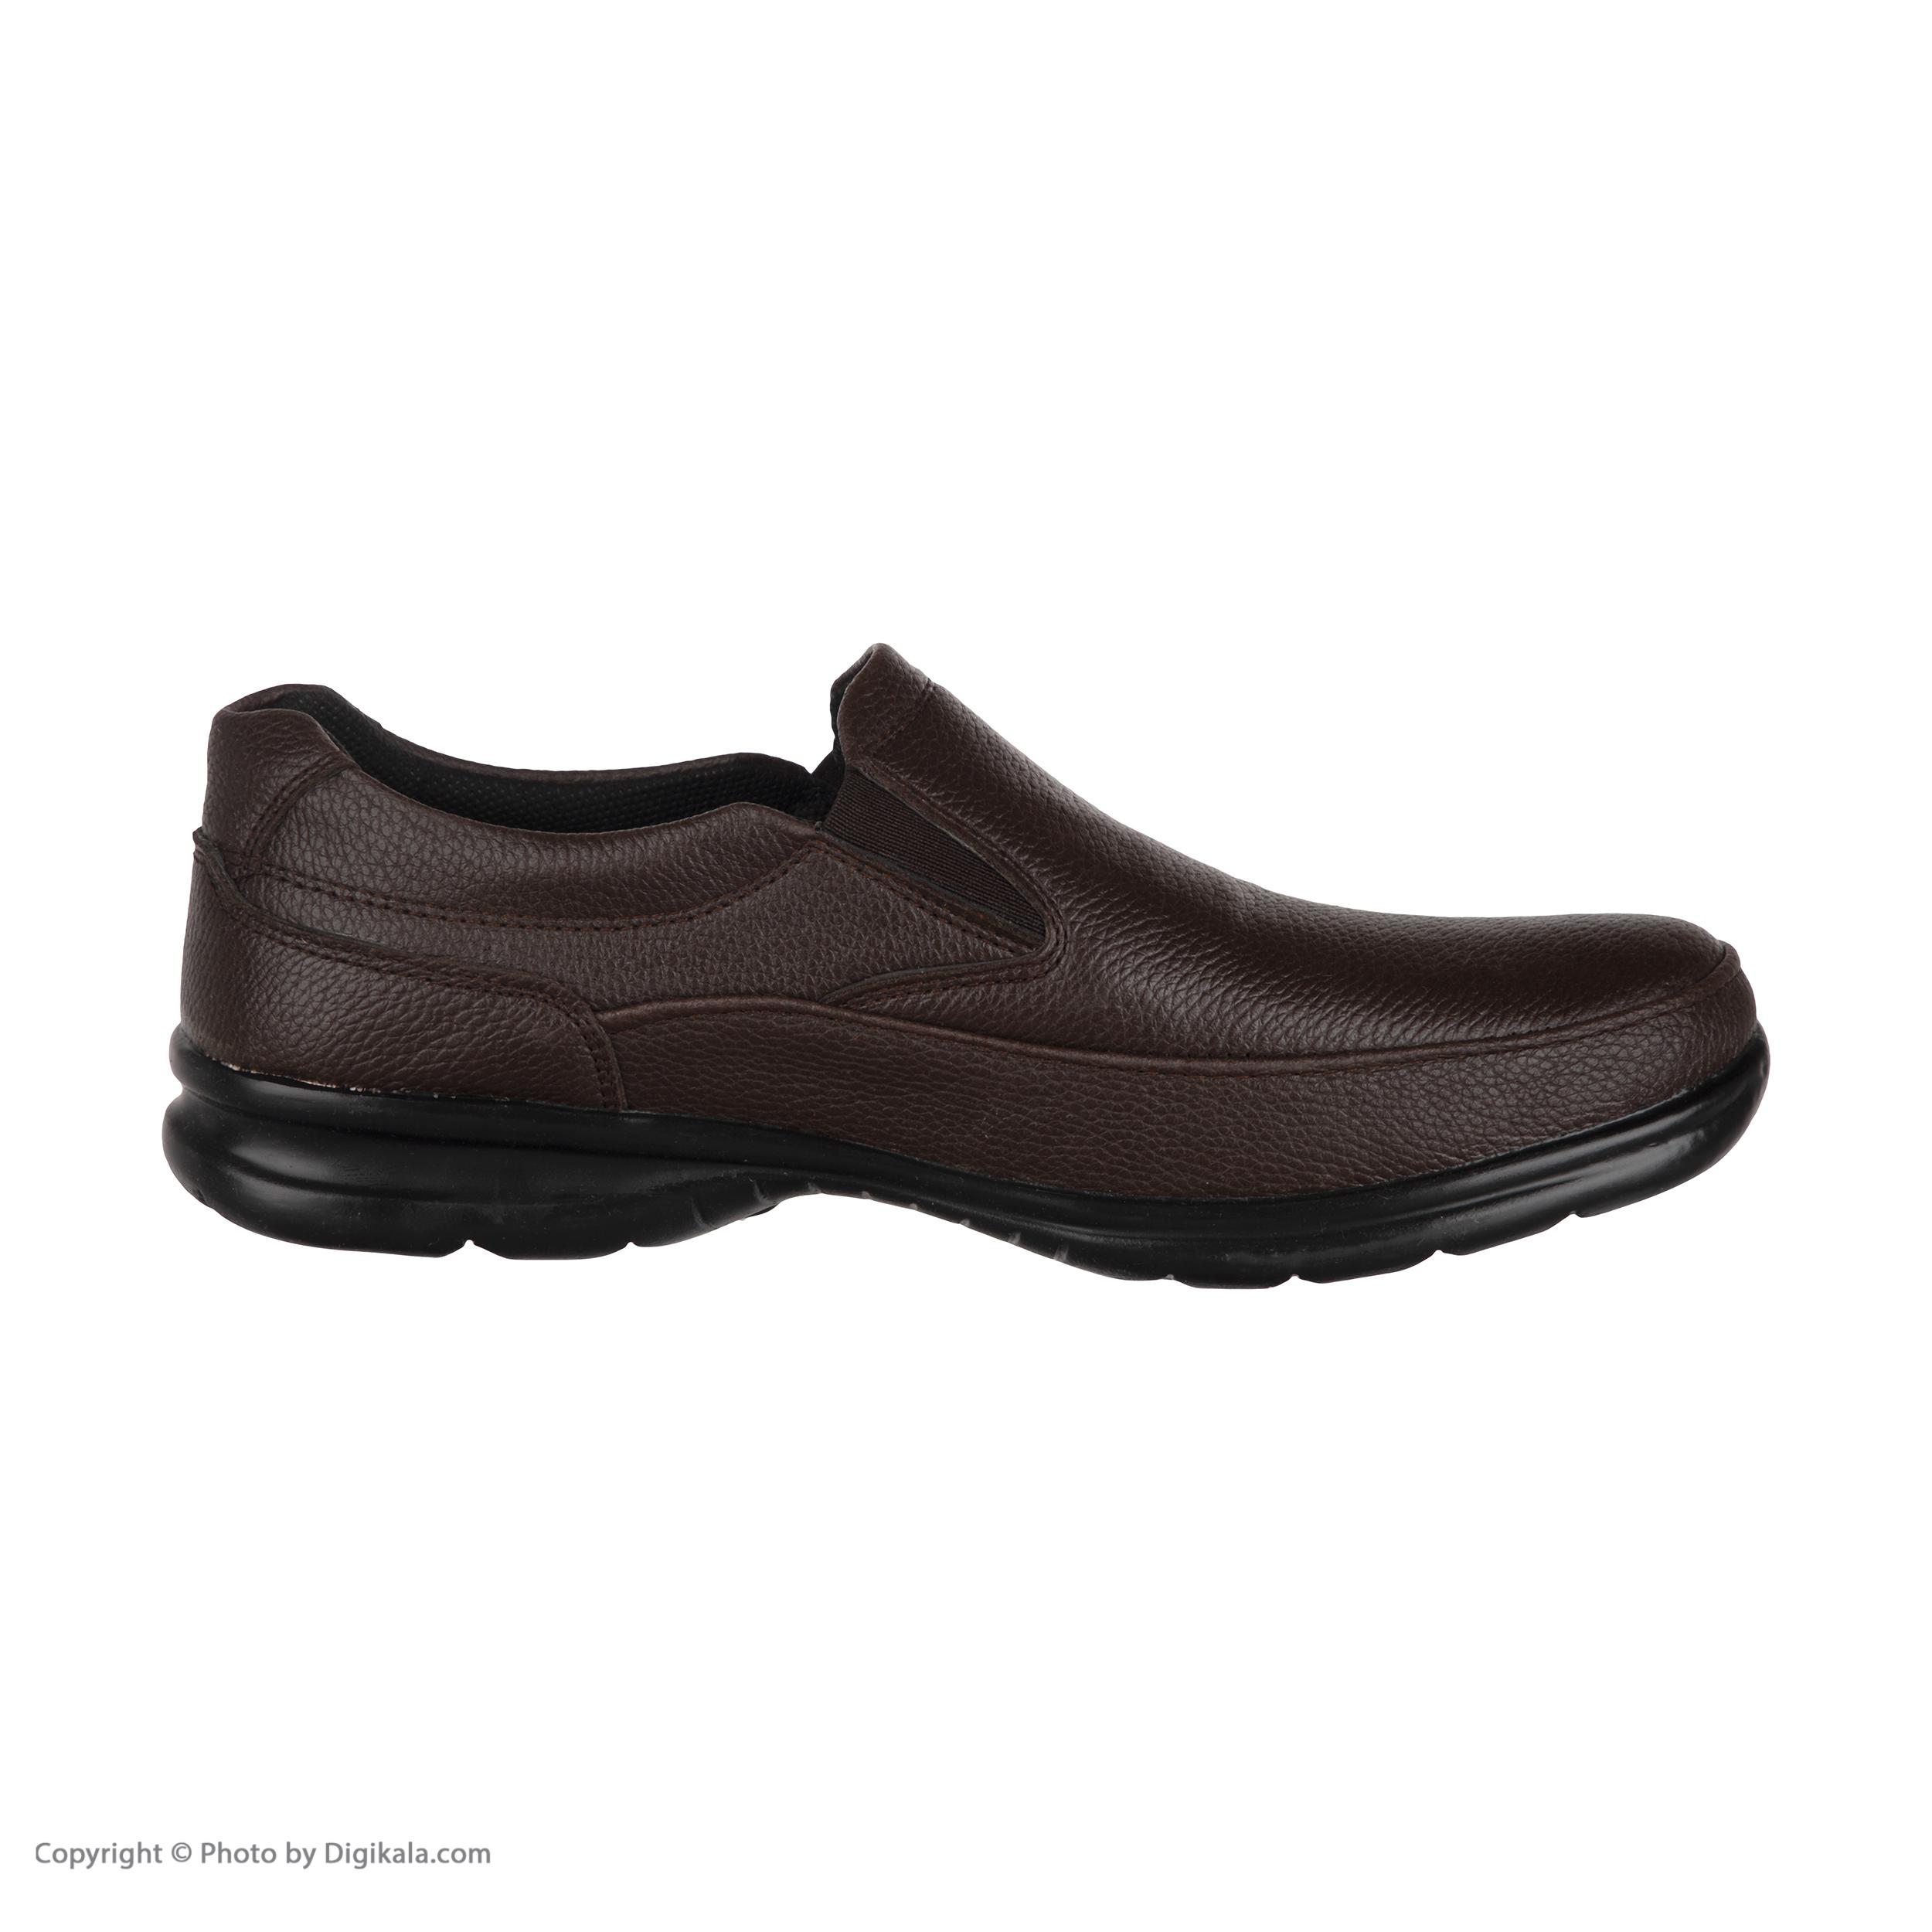 کفش روزمره مردانه مدل k.baz.073 -  - 7